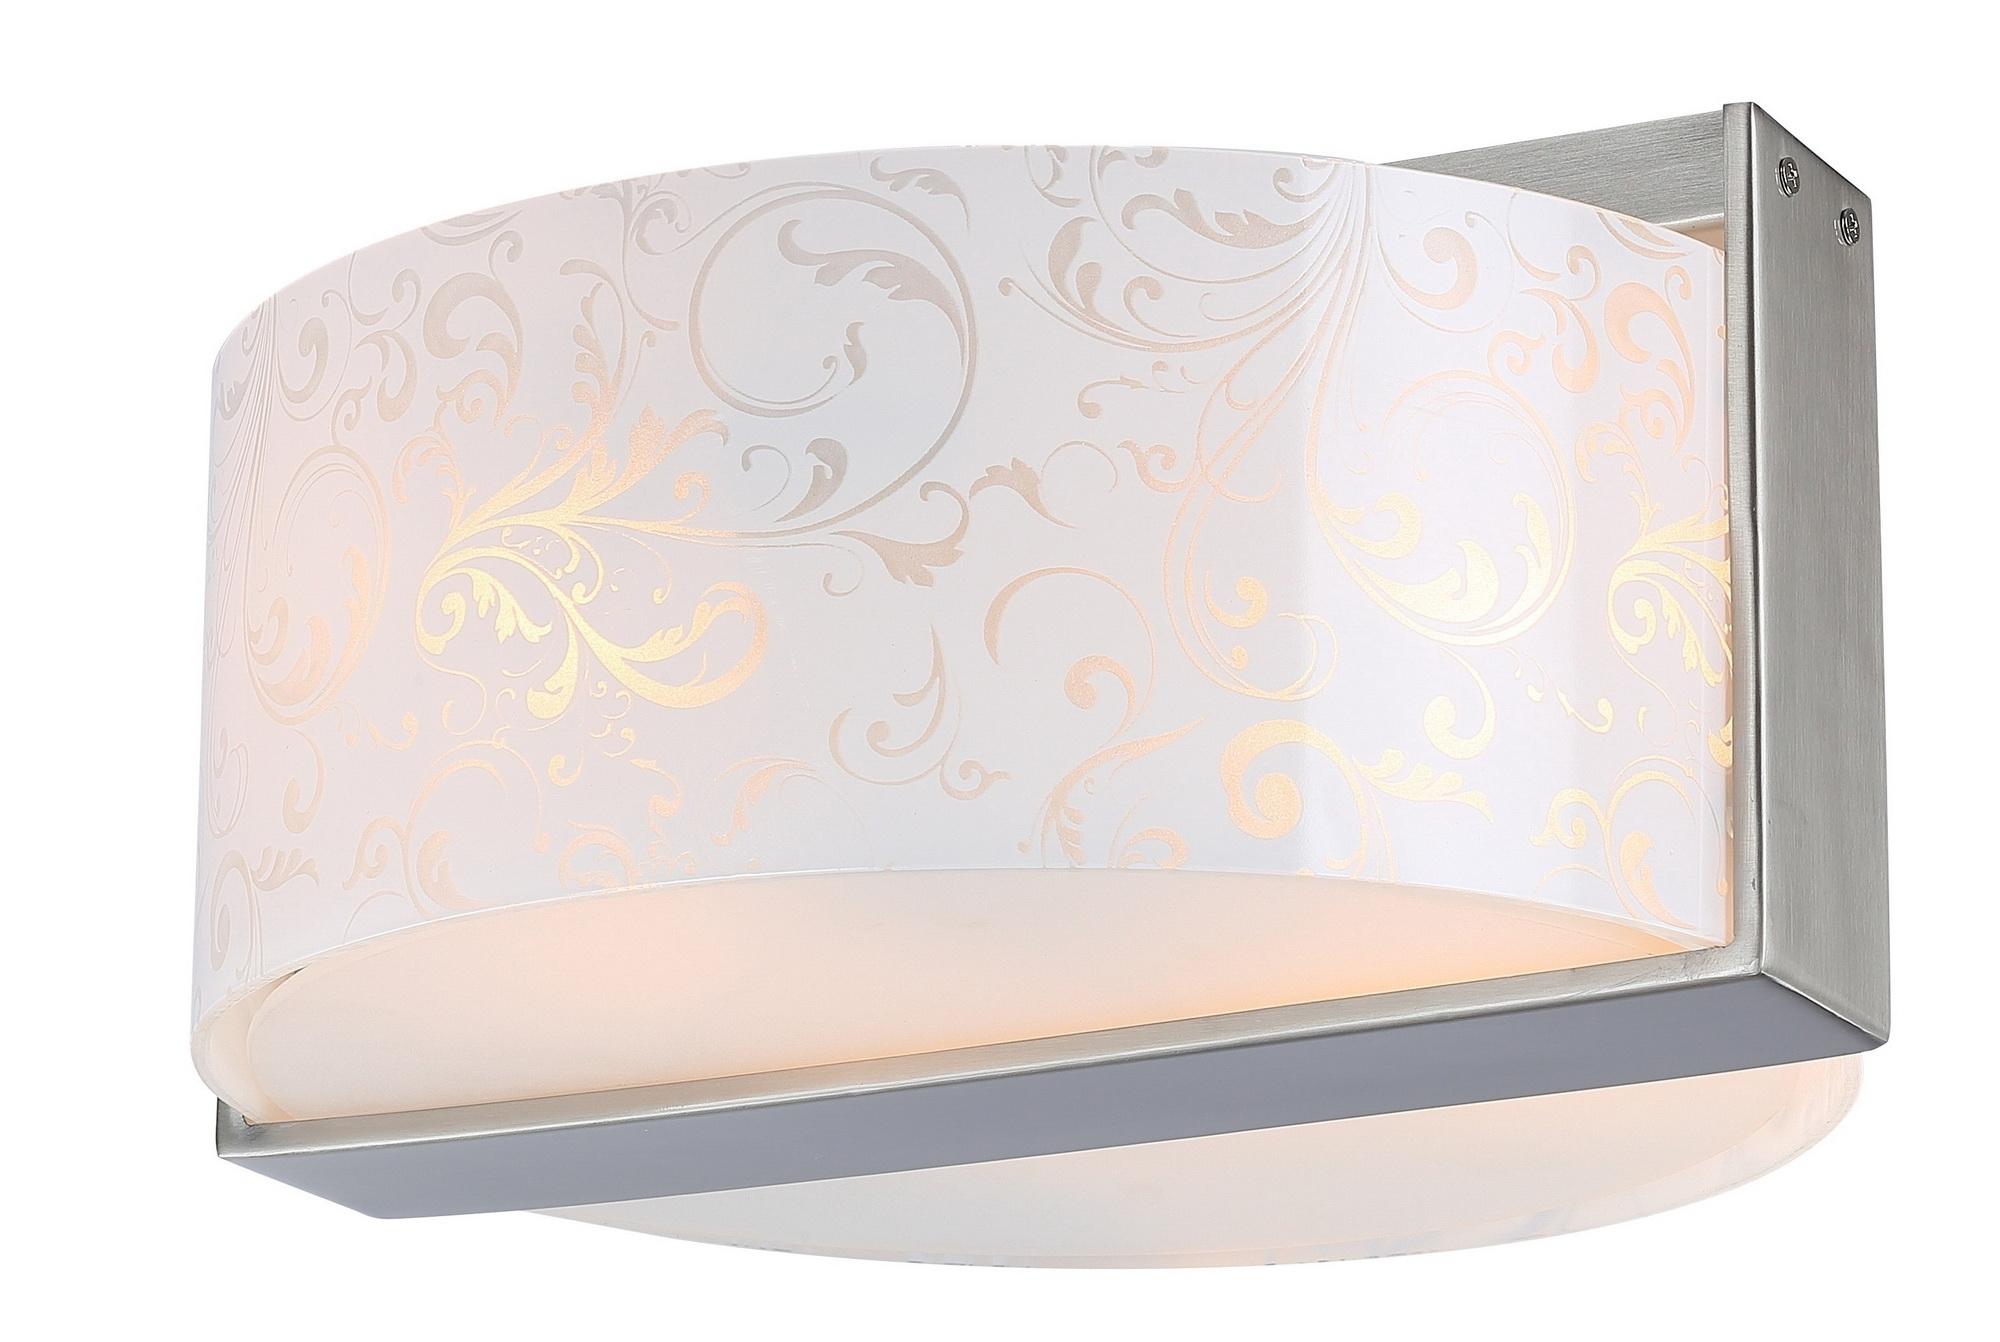 Люстра Arte lamp Bella a5615pl-2ss